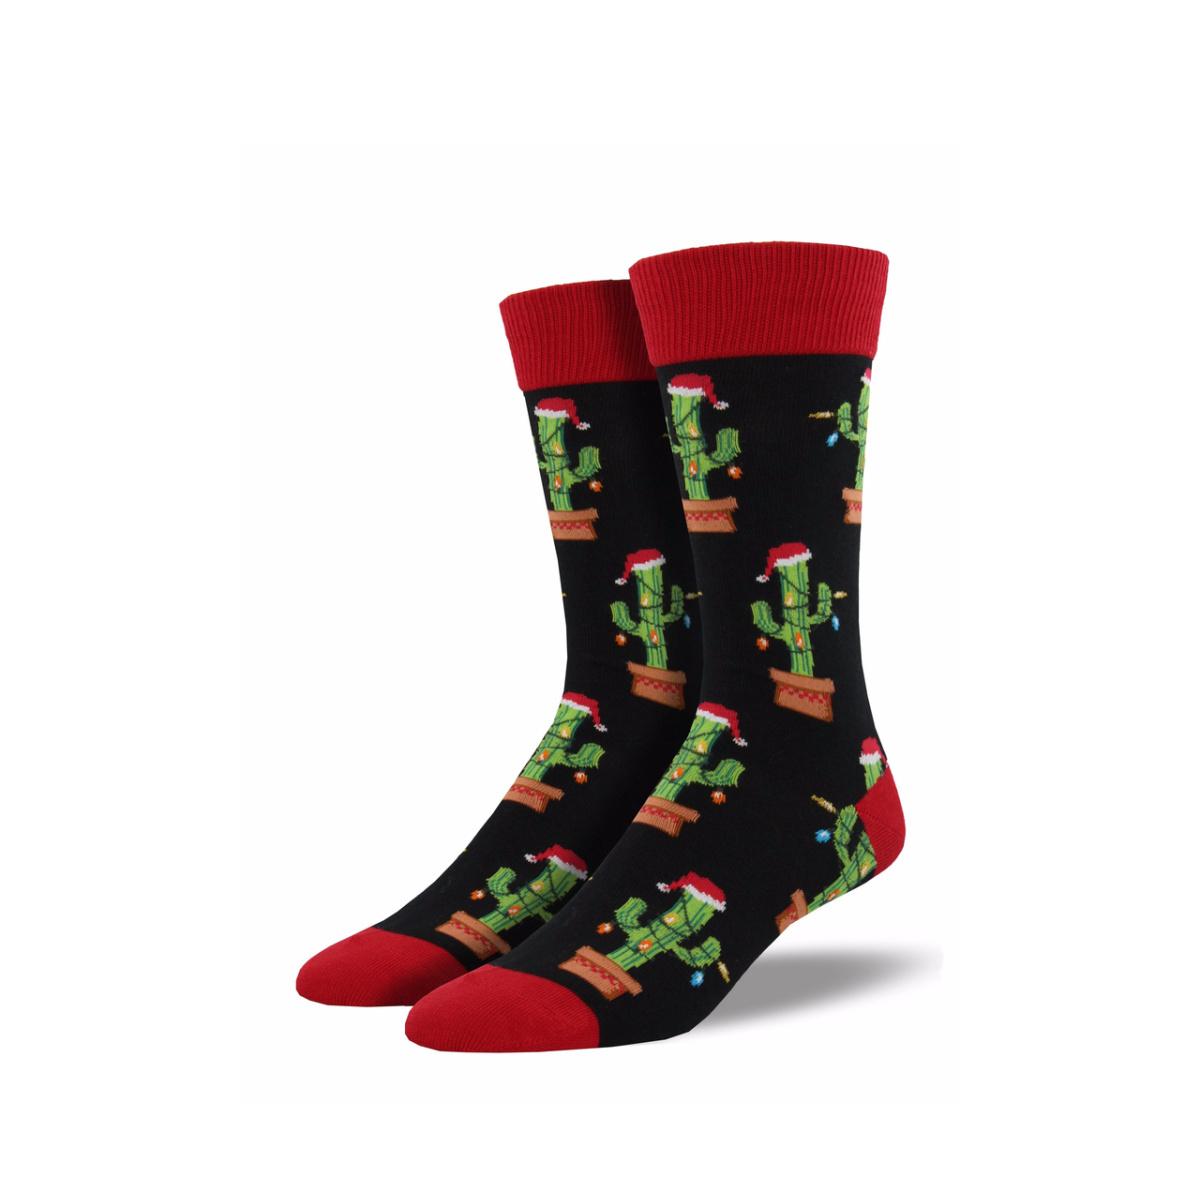 Socksmith Socksmith Men's Cotton Crew Socks Christmas Cactus